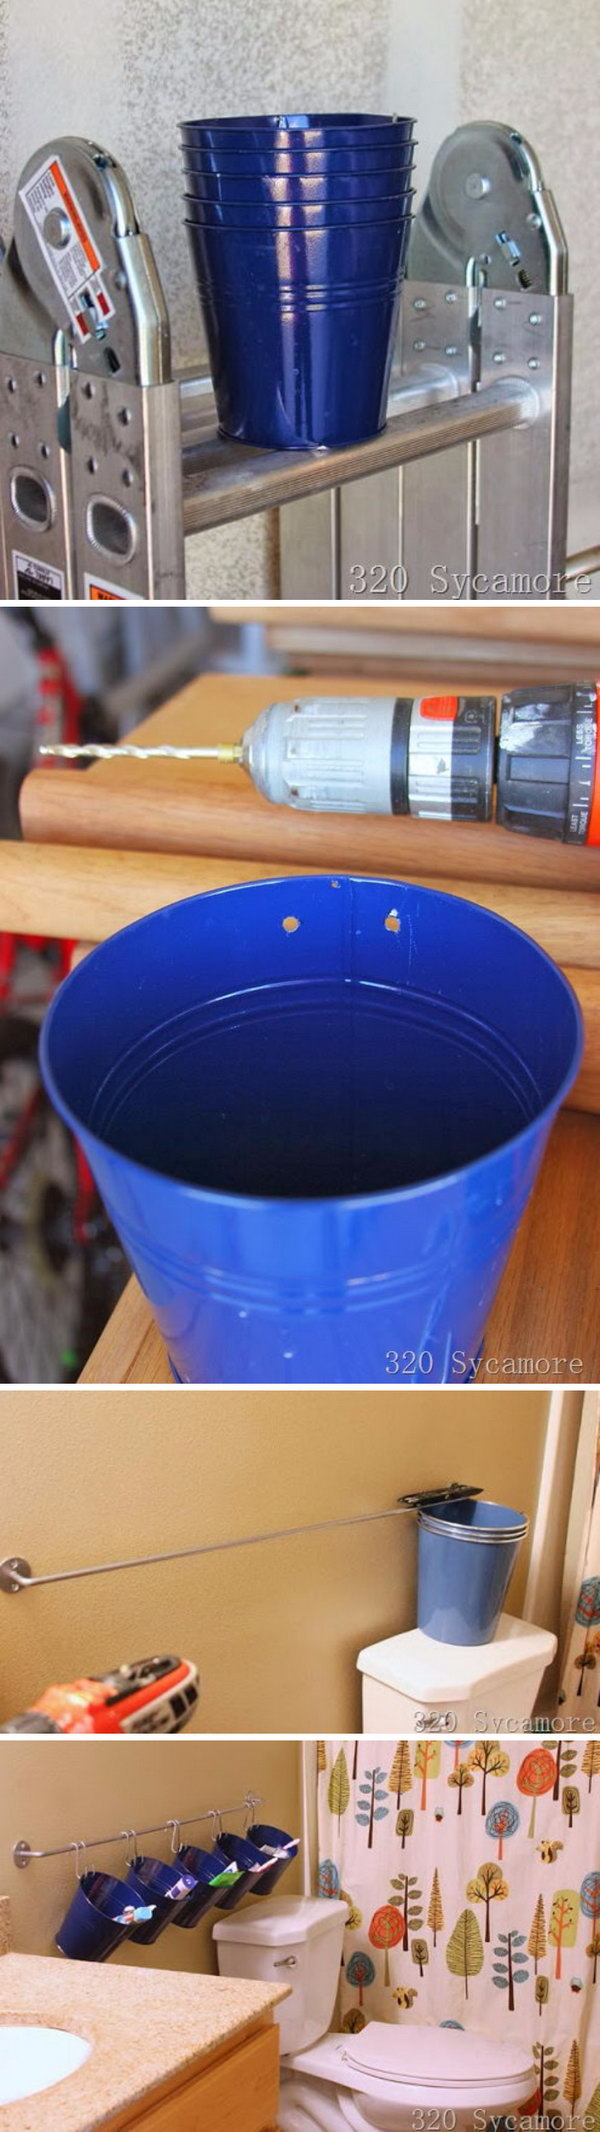 Toothbrush storage Using Ikea And Dollar Store Buckets.